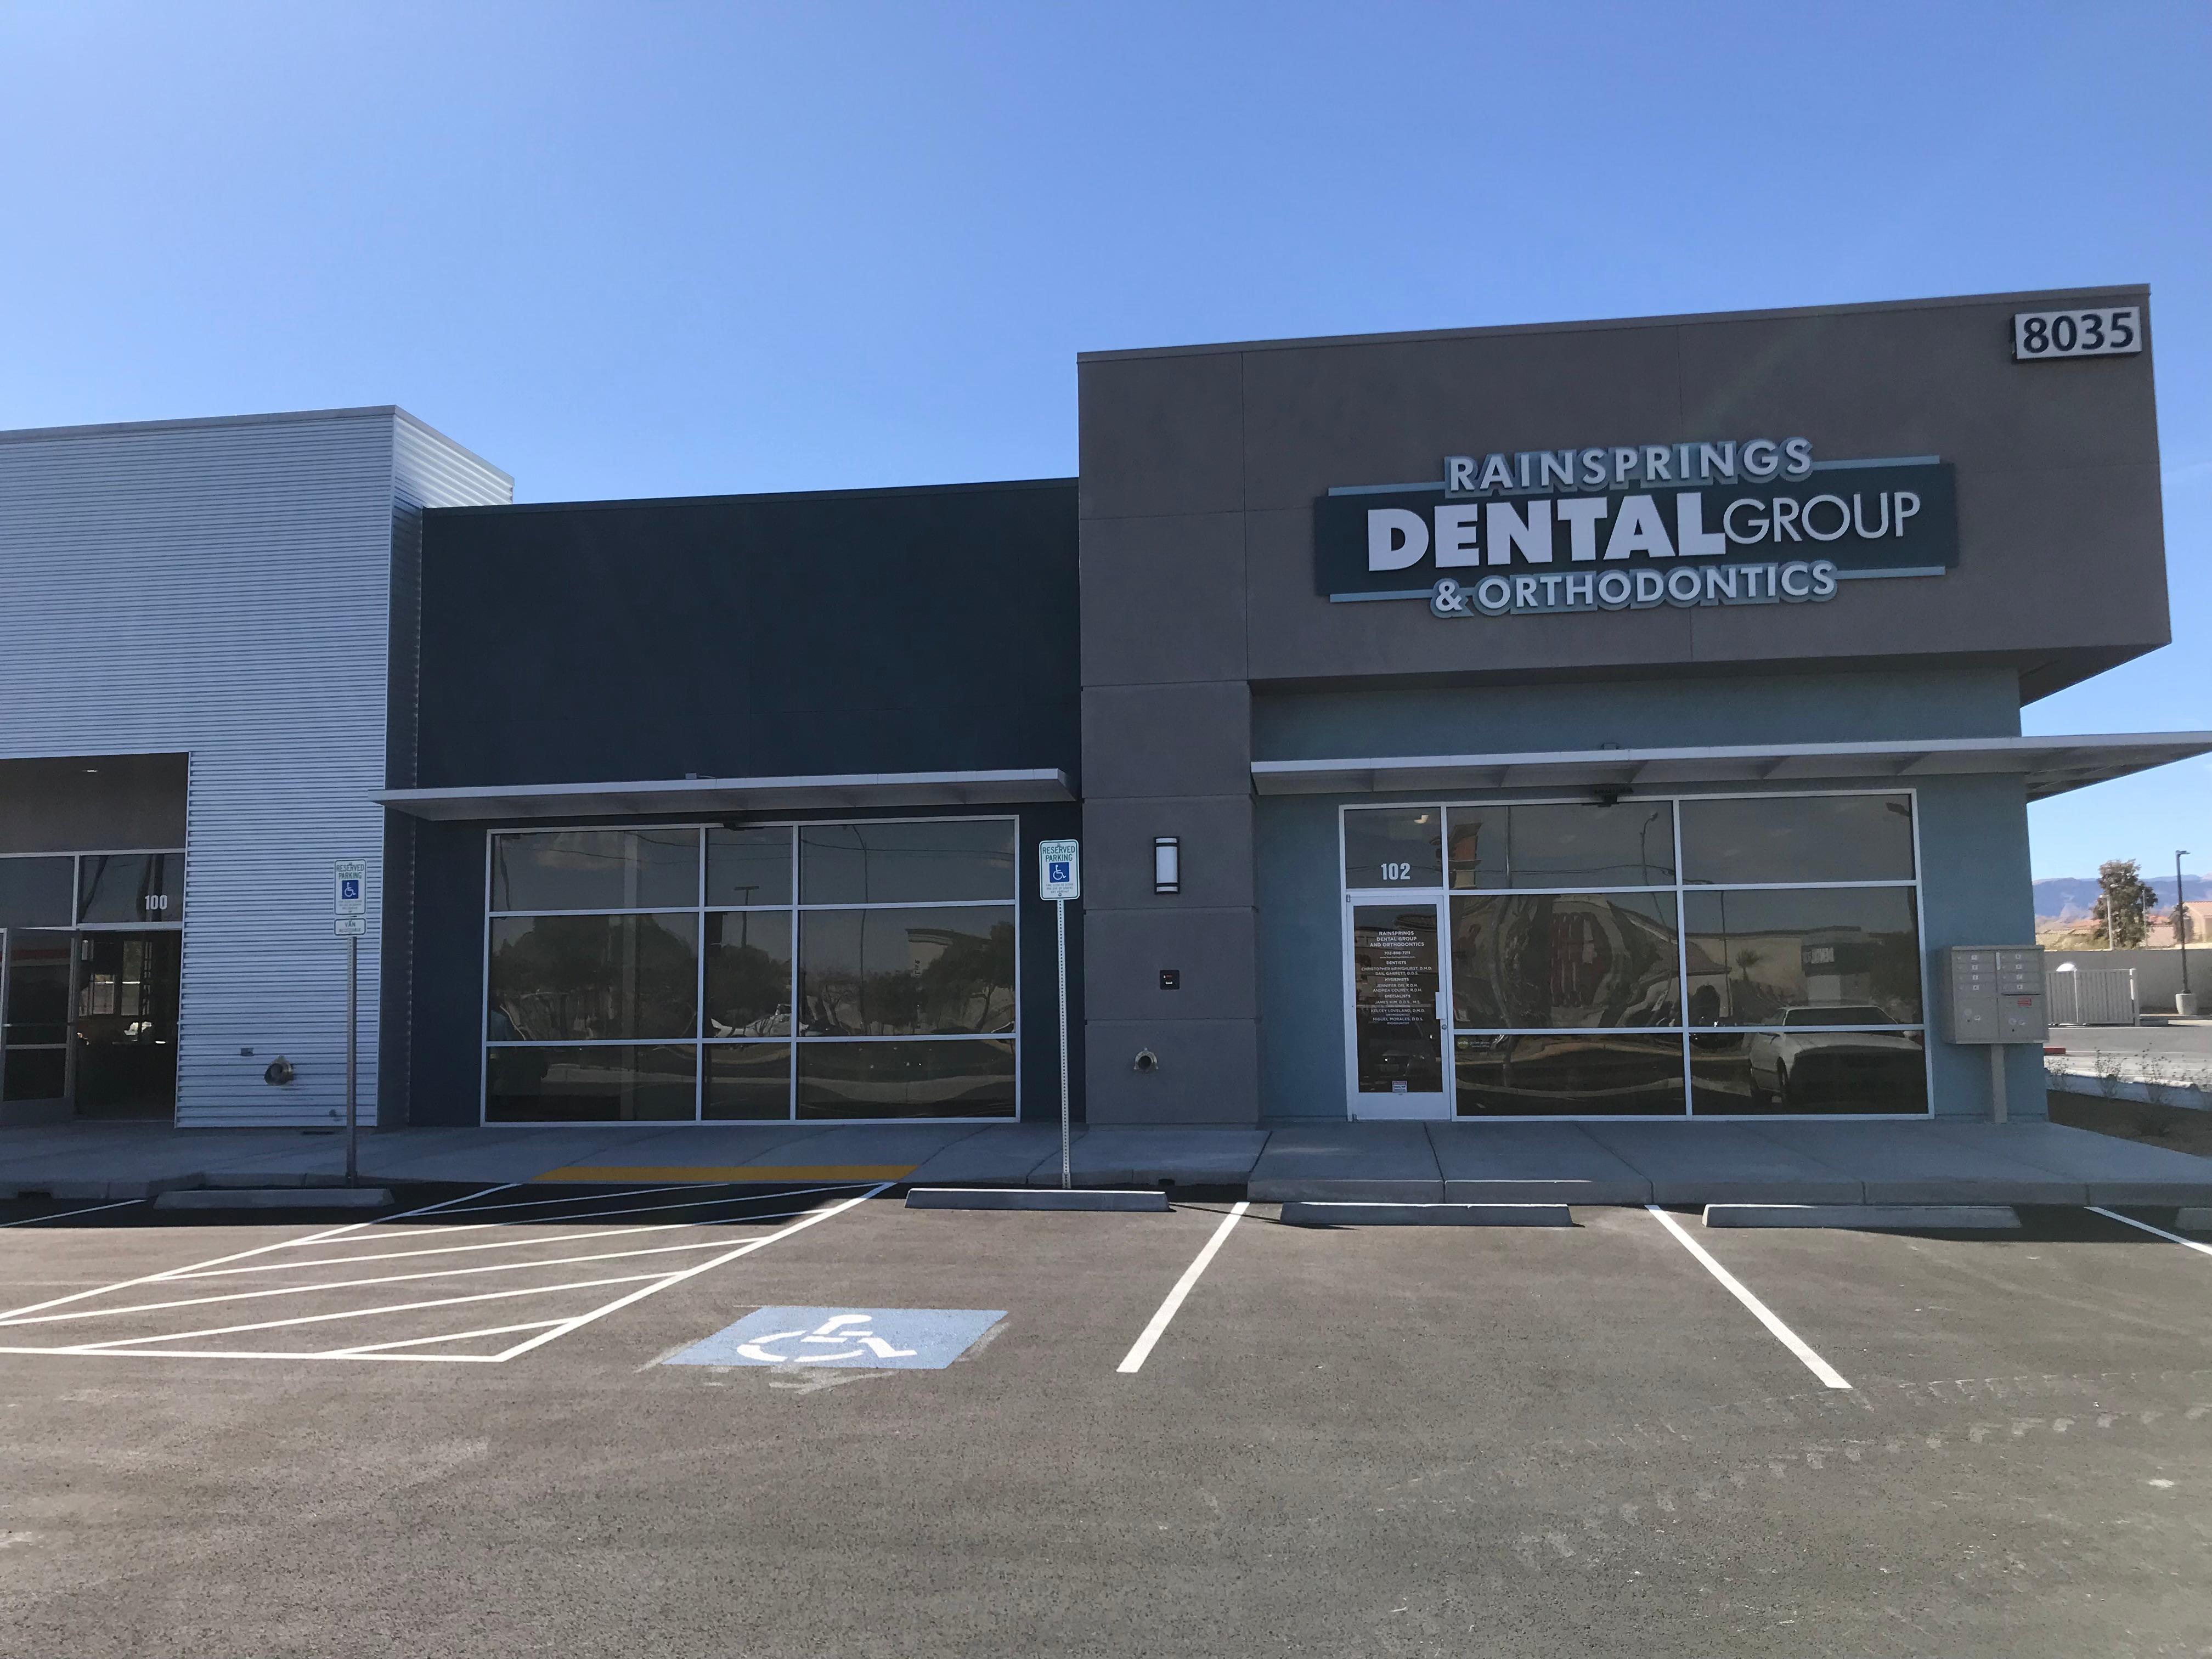 Rainsprings Dental Group and Orthodontics image 0